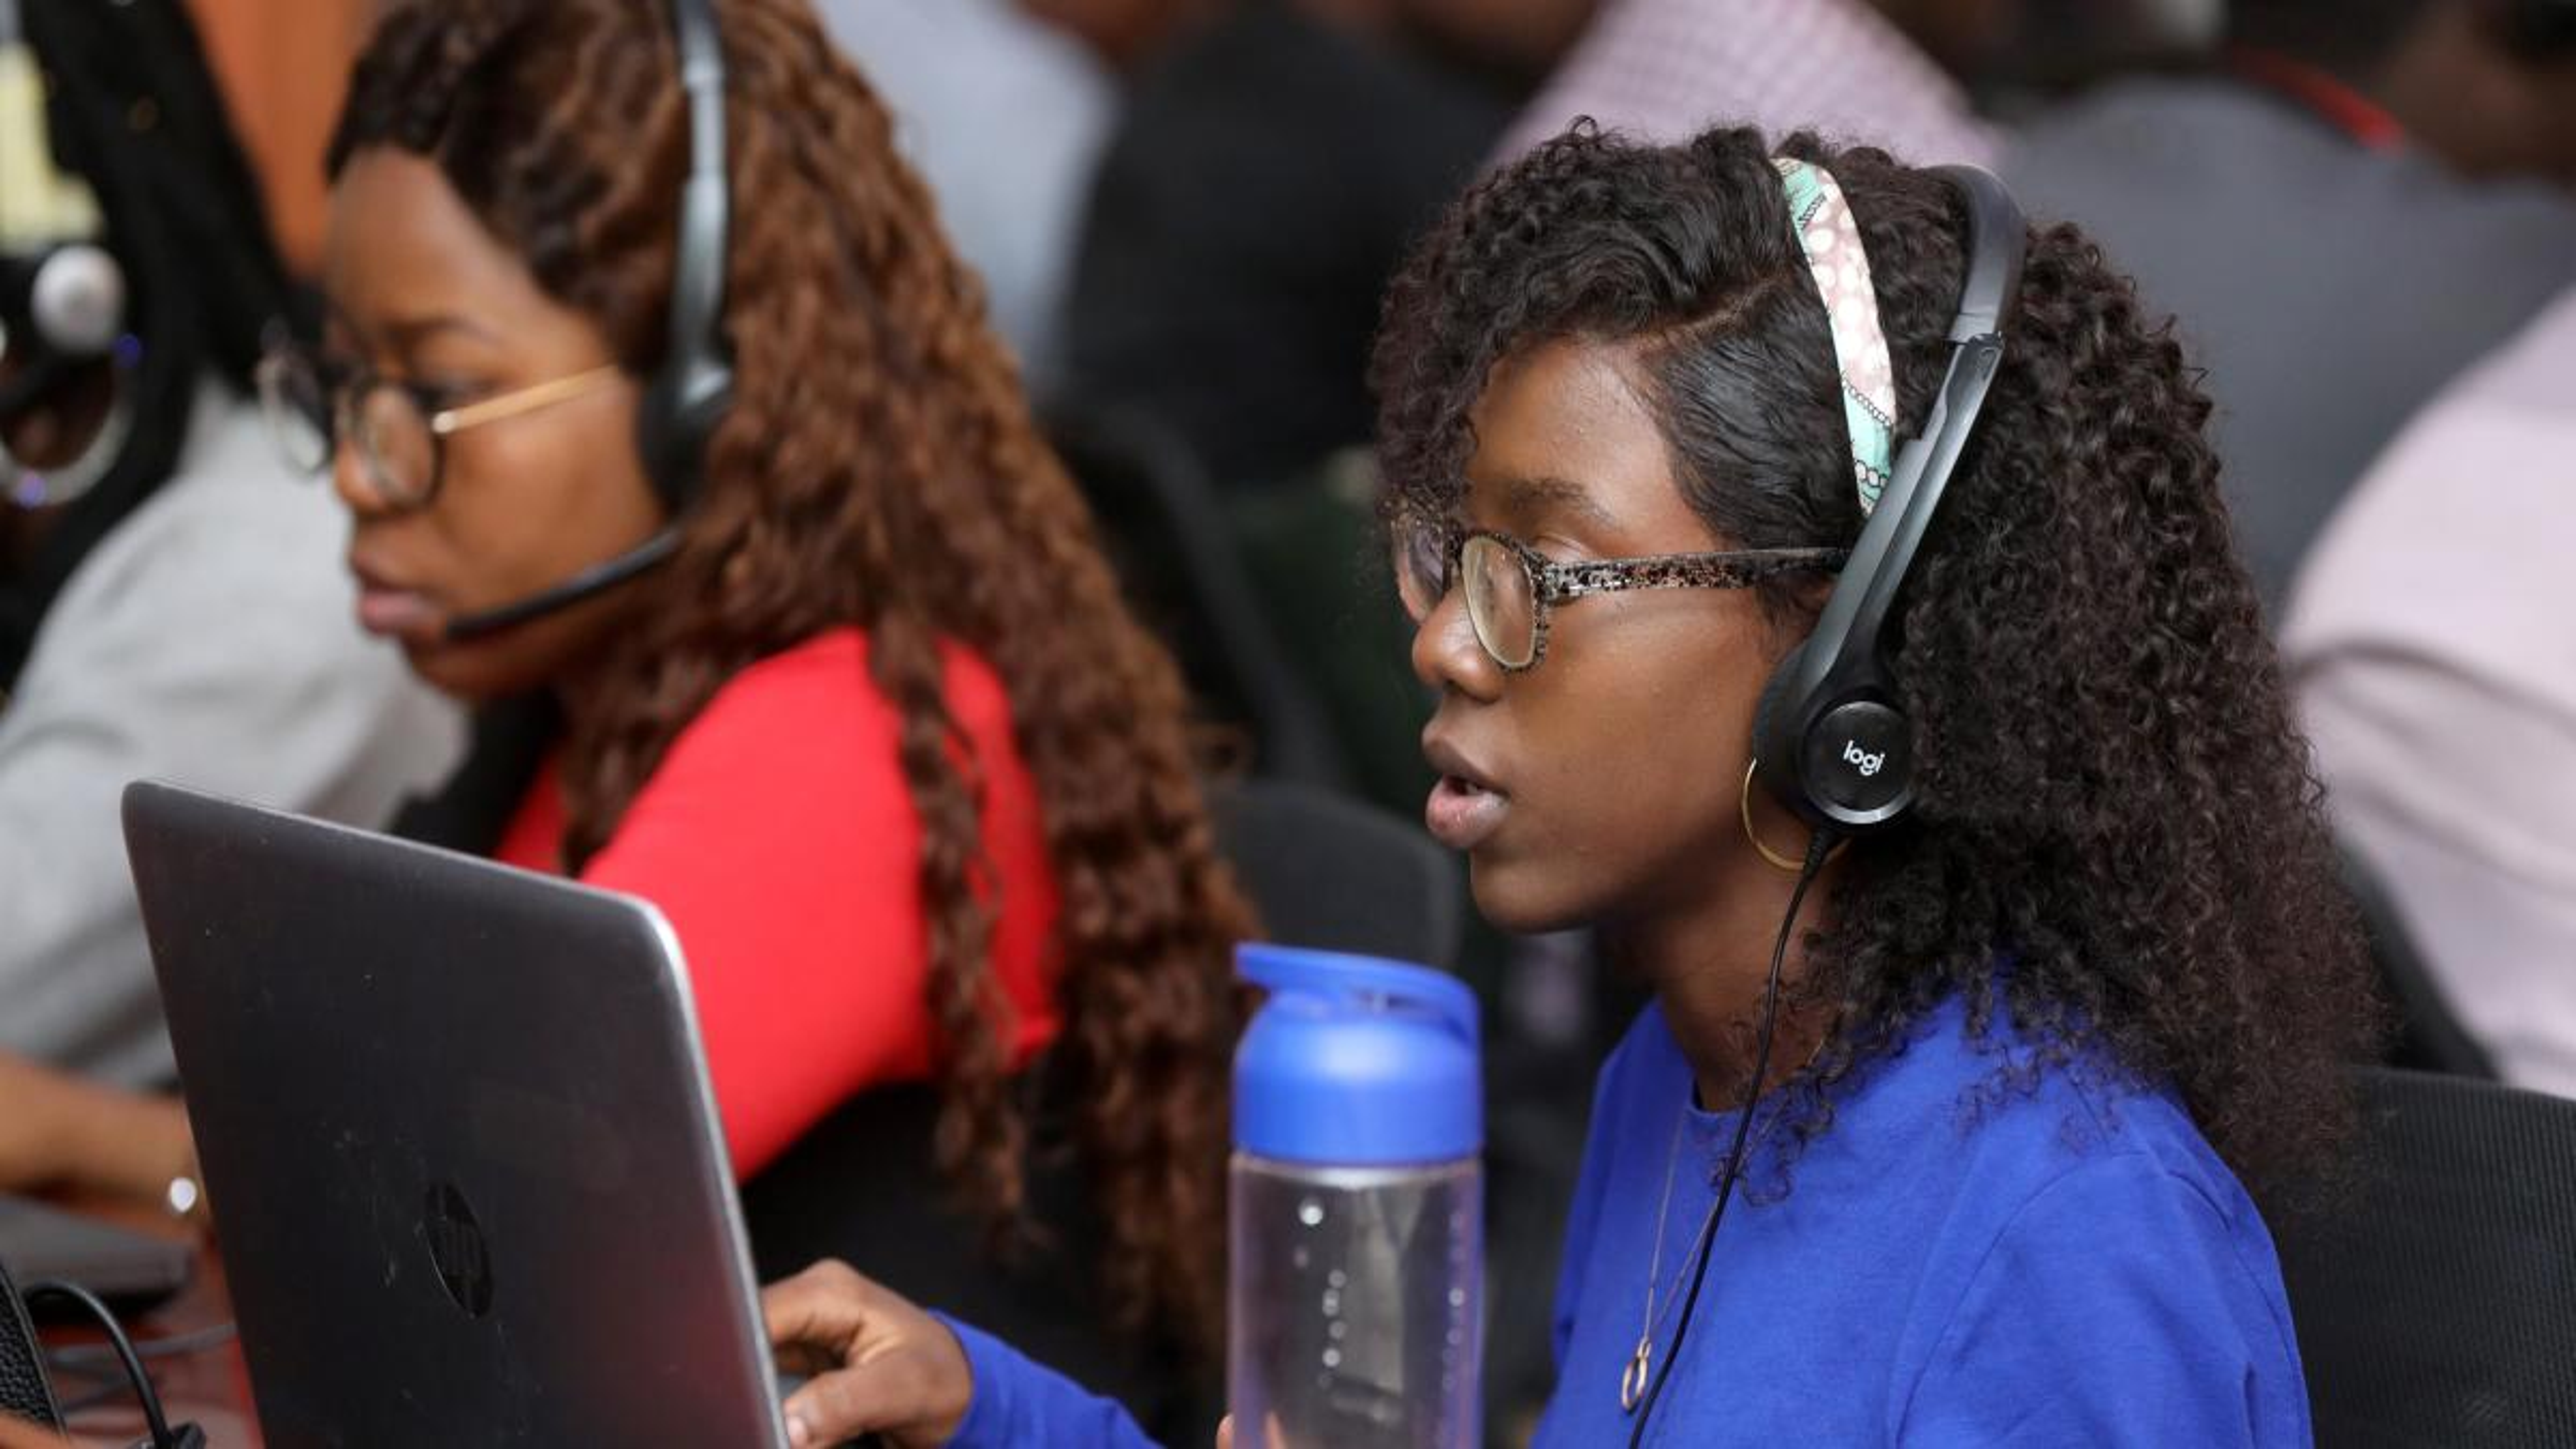 Africa's e-commerce gender gap is costing billions of dollars